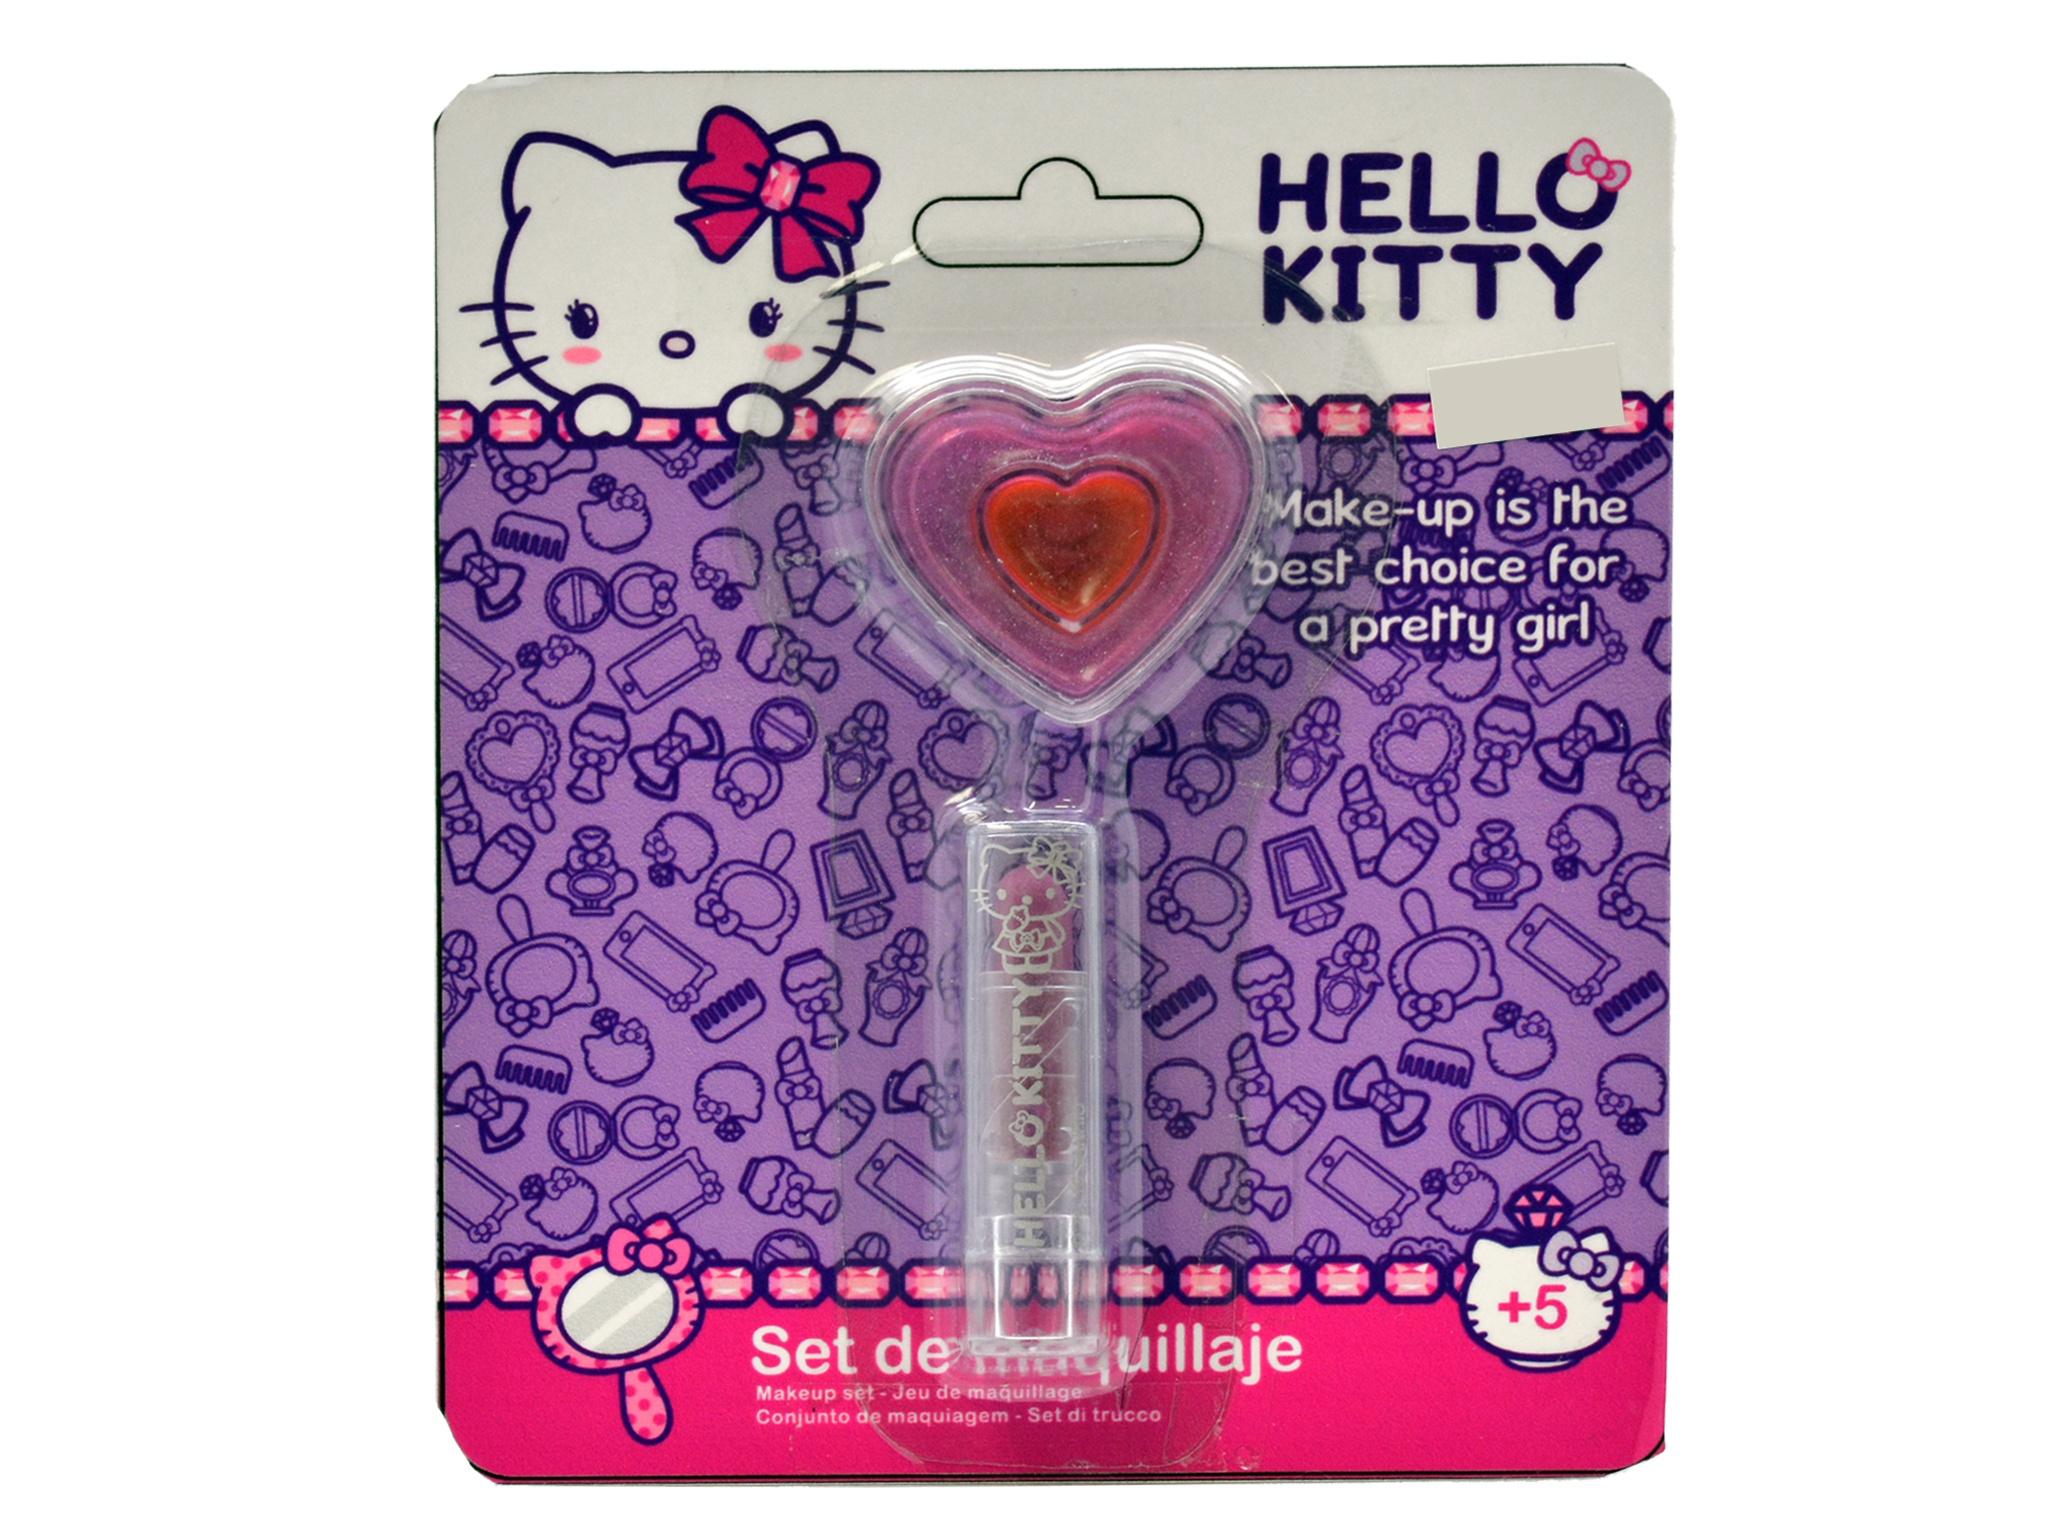 d4214571500f Falca lipstick set Hello Kitty girls 2-piece - Internet-Toys